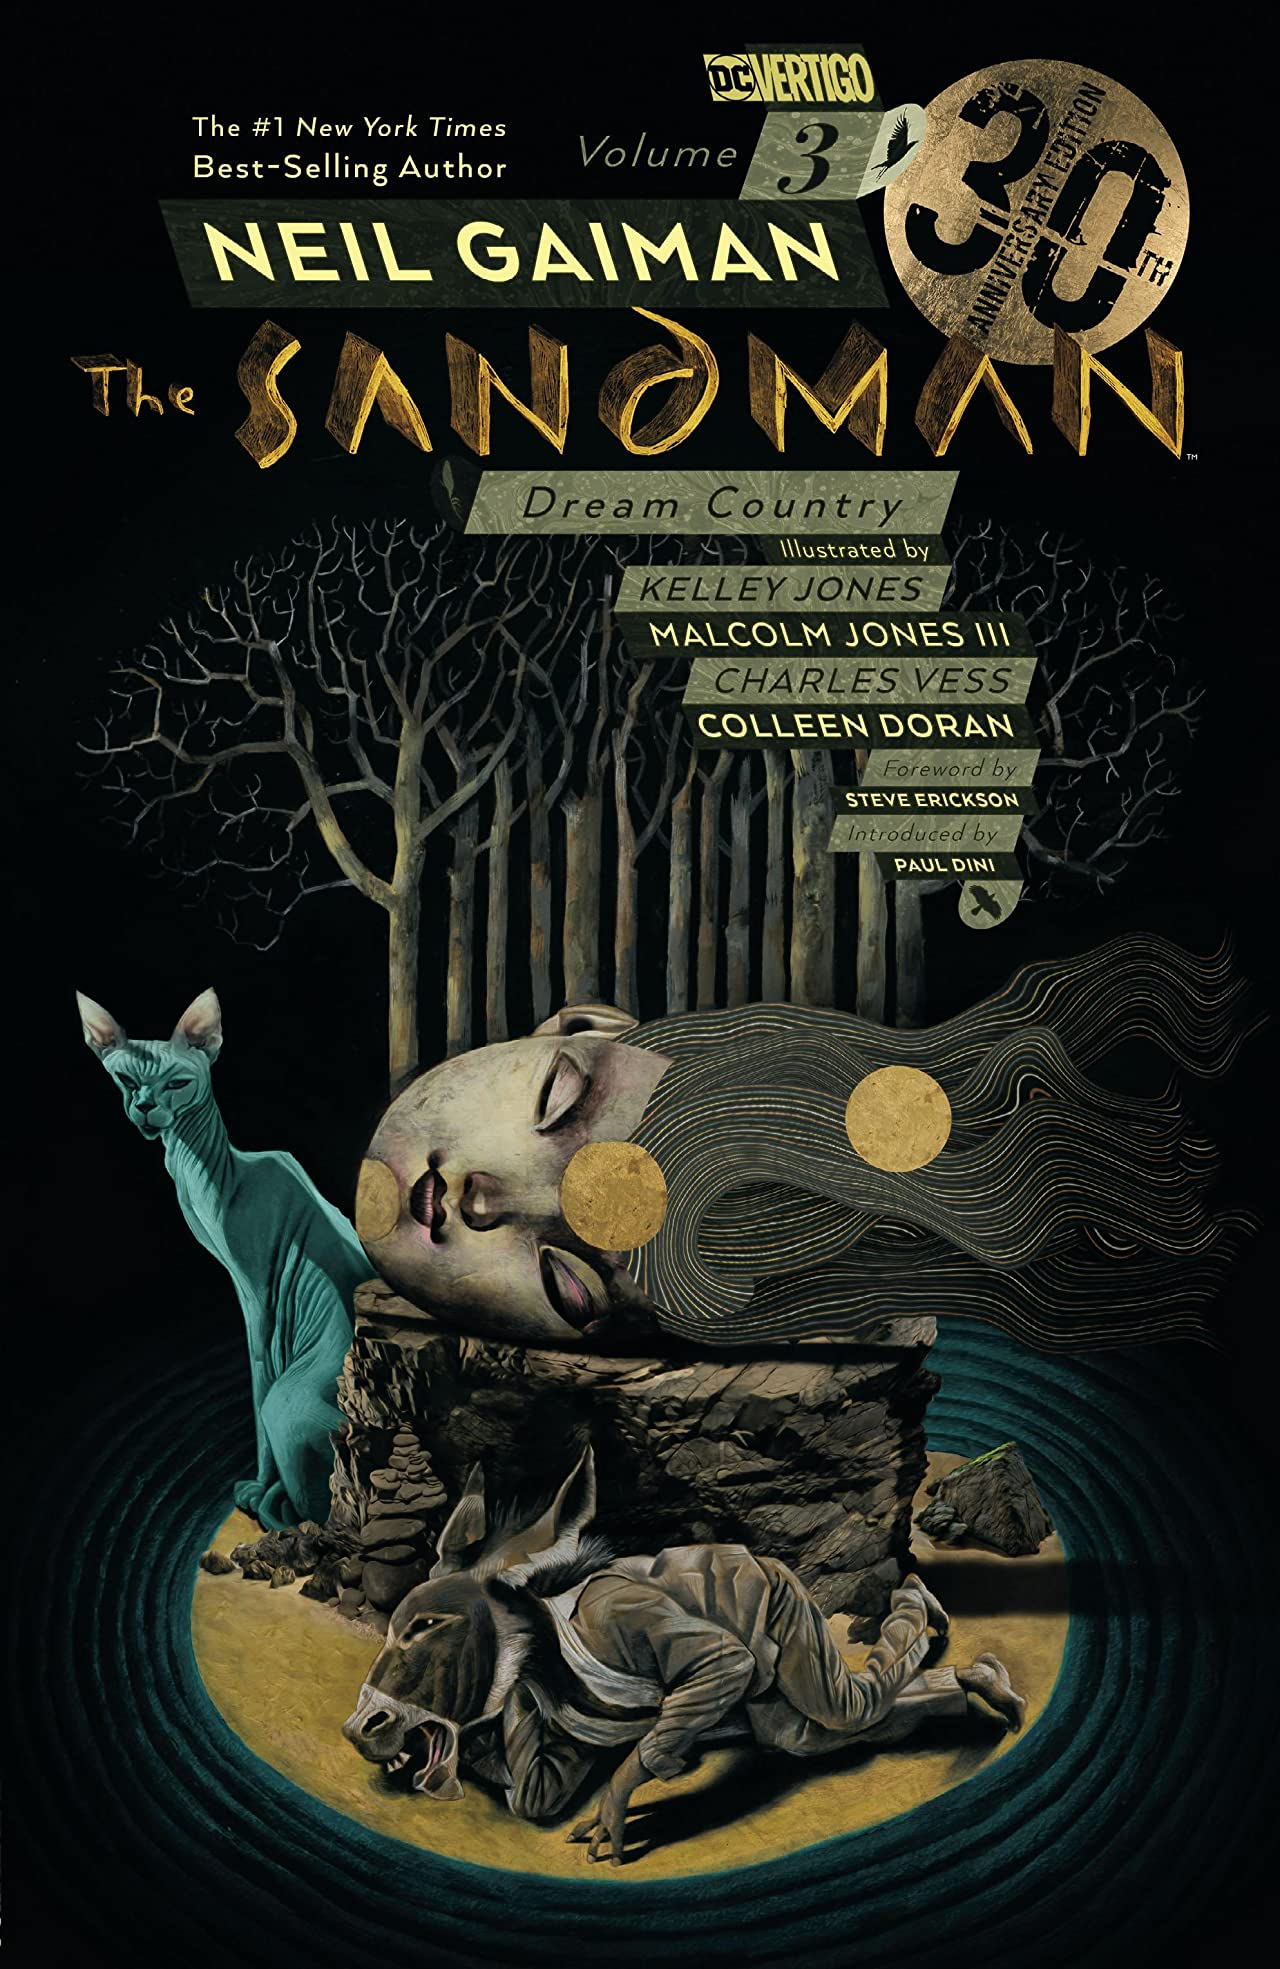 Sandman Vol. 3: Dream Country - 30th Anniversary Edition